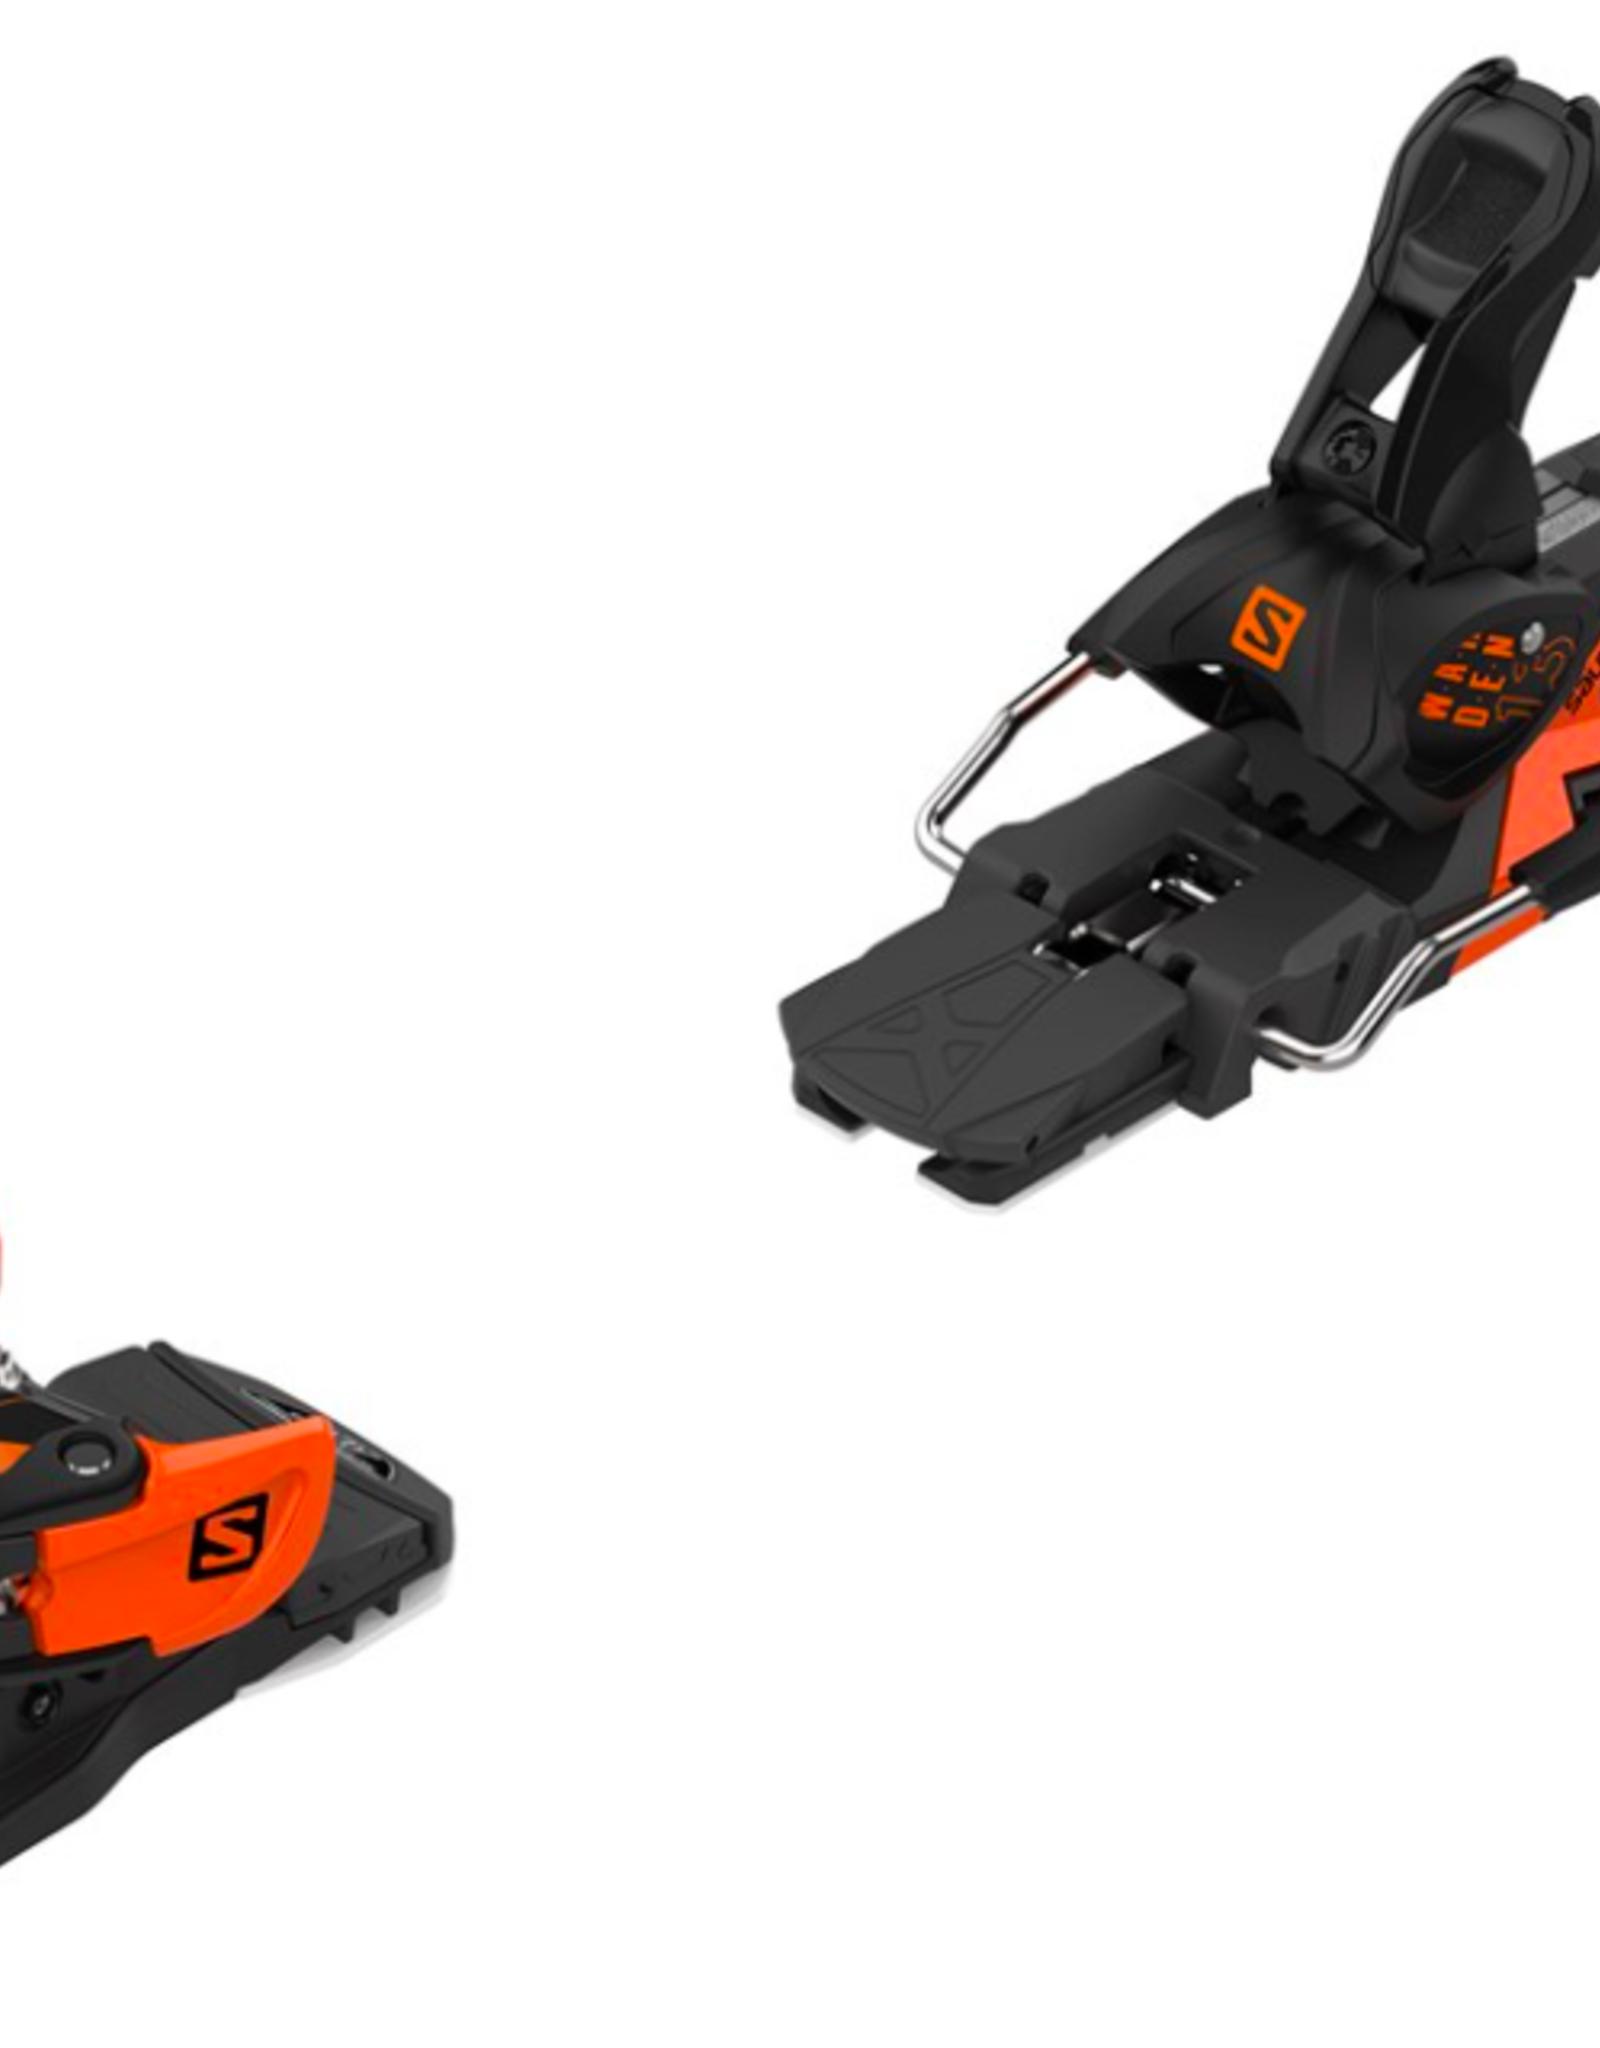 Salomon Warden MNC 13 Ski Bindings Black/Orange 2022